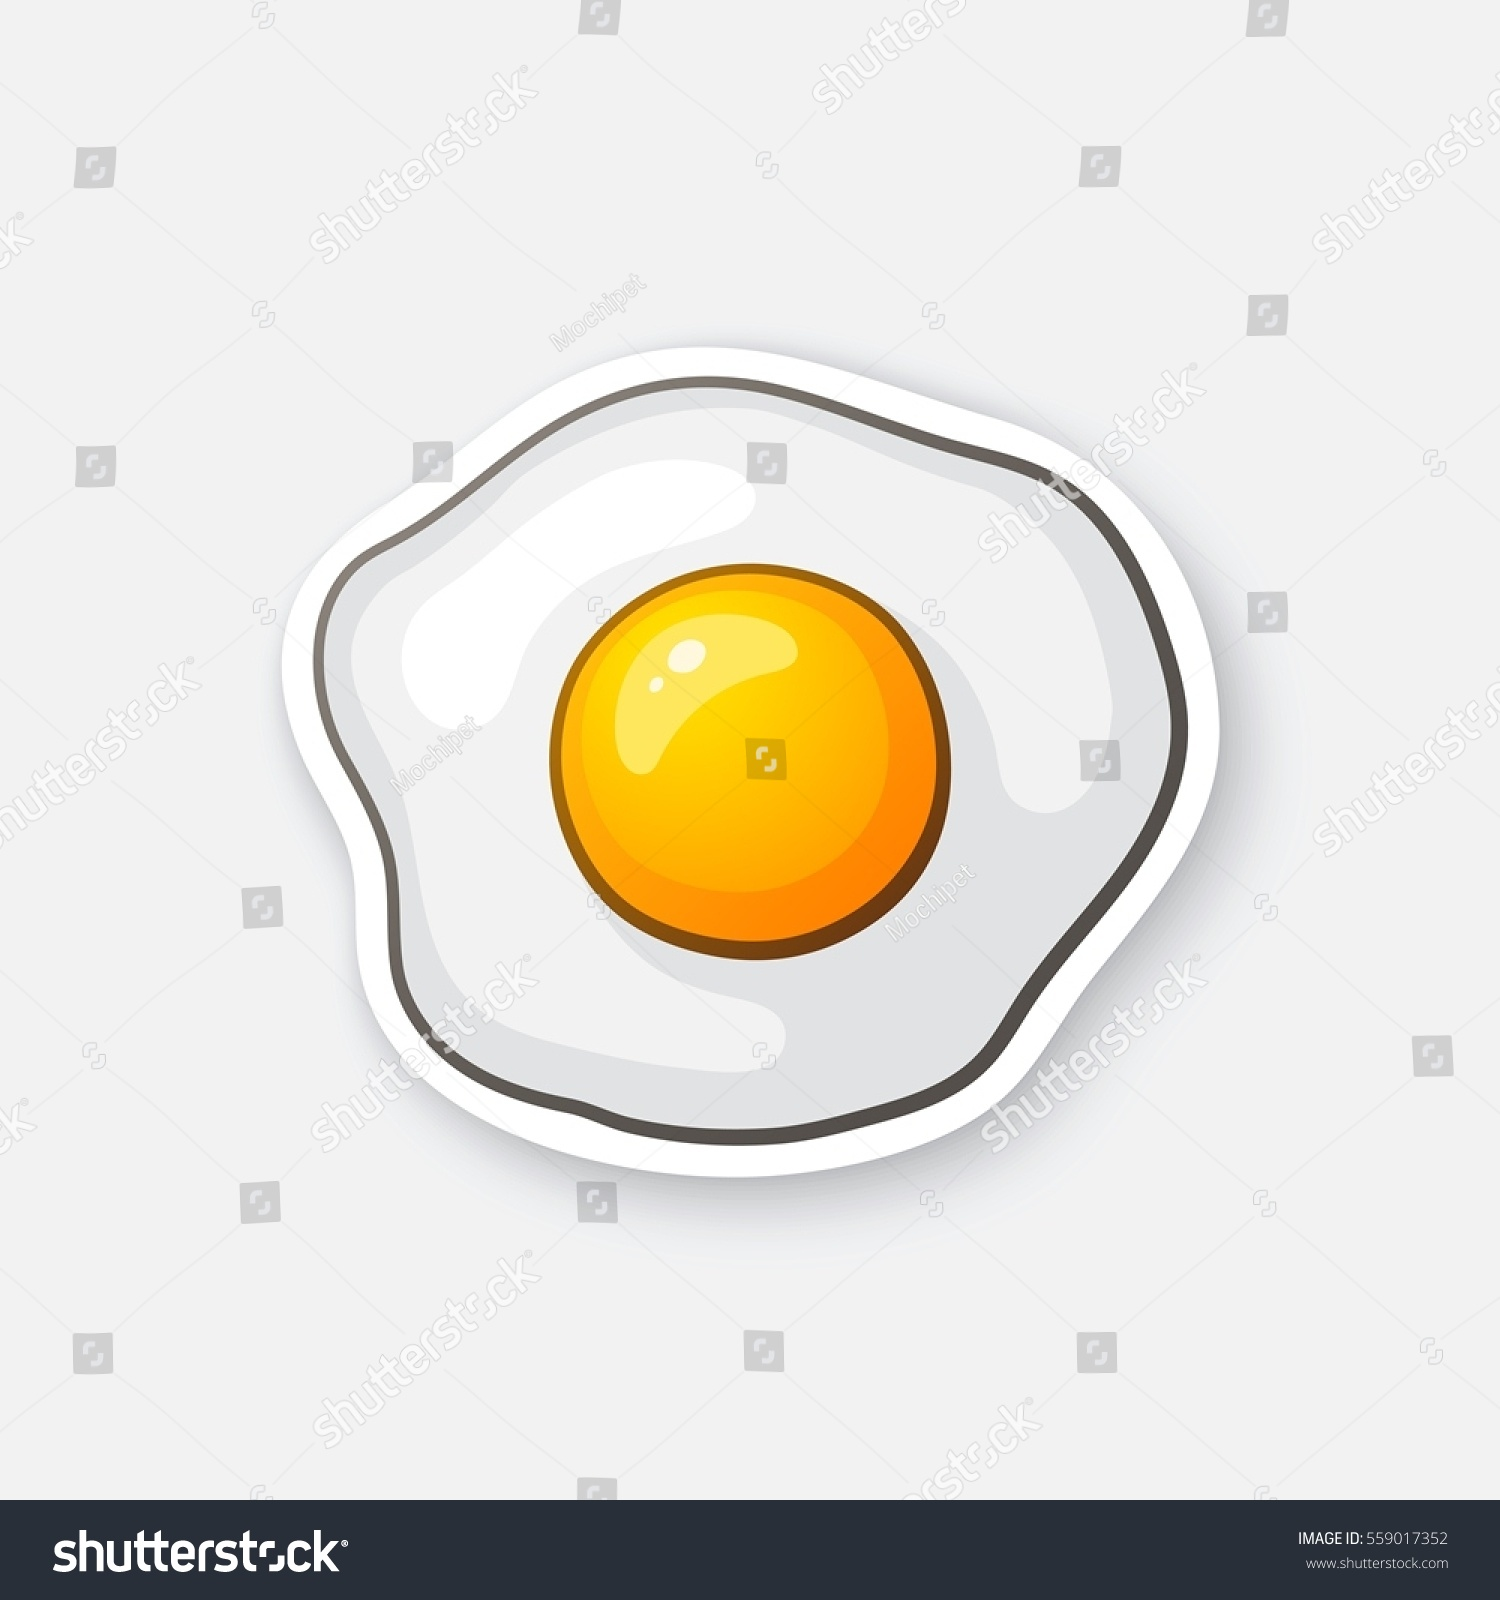 vector illustration one fried egg scrambled stock vector 559017352